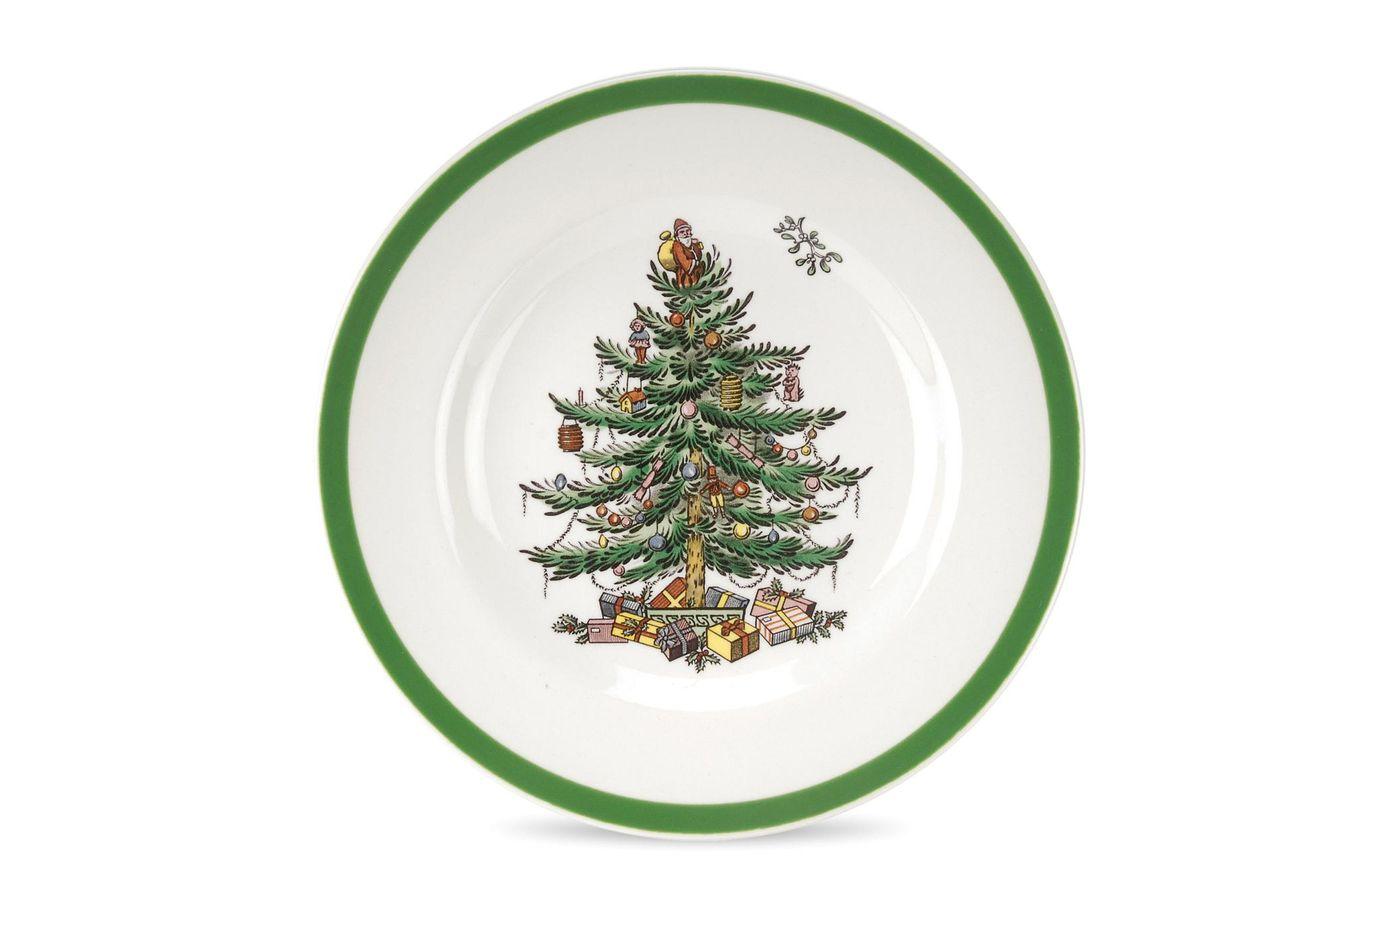 "Spode Christmas Tree Tea / Side / Bread & Butter Plate 6 1/2"" thumb 1"